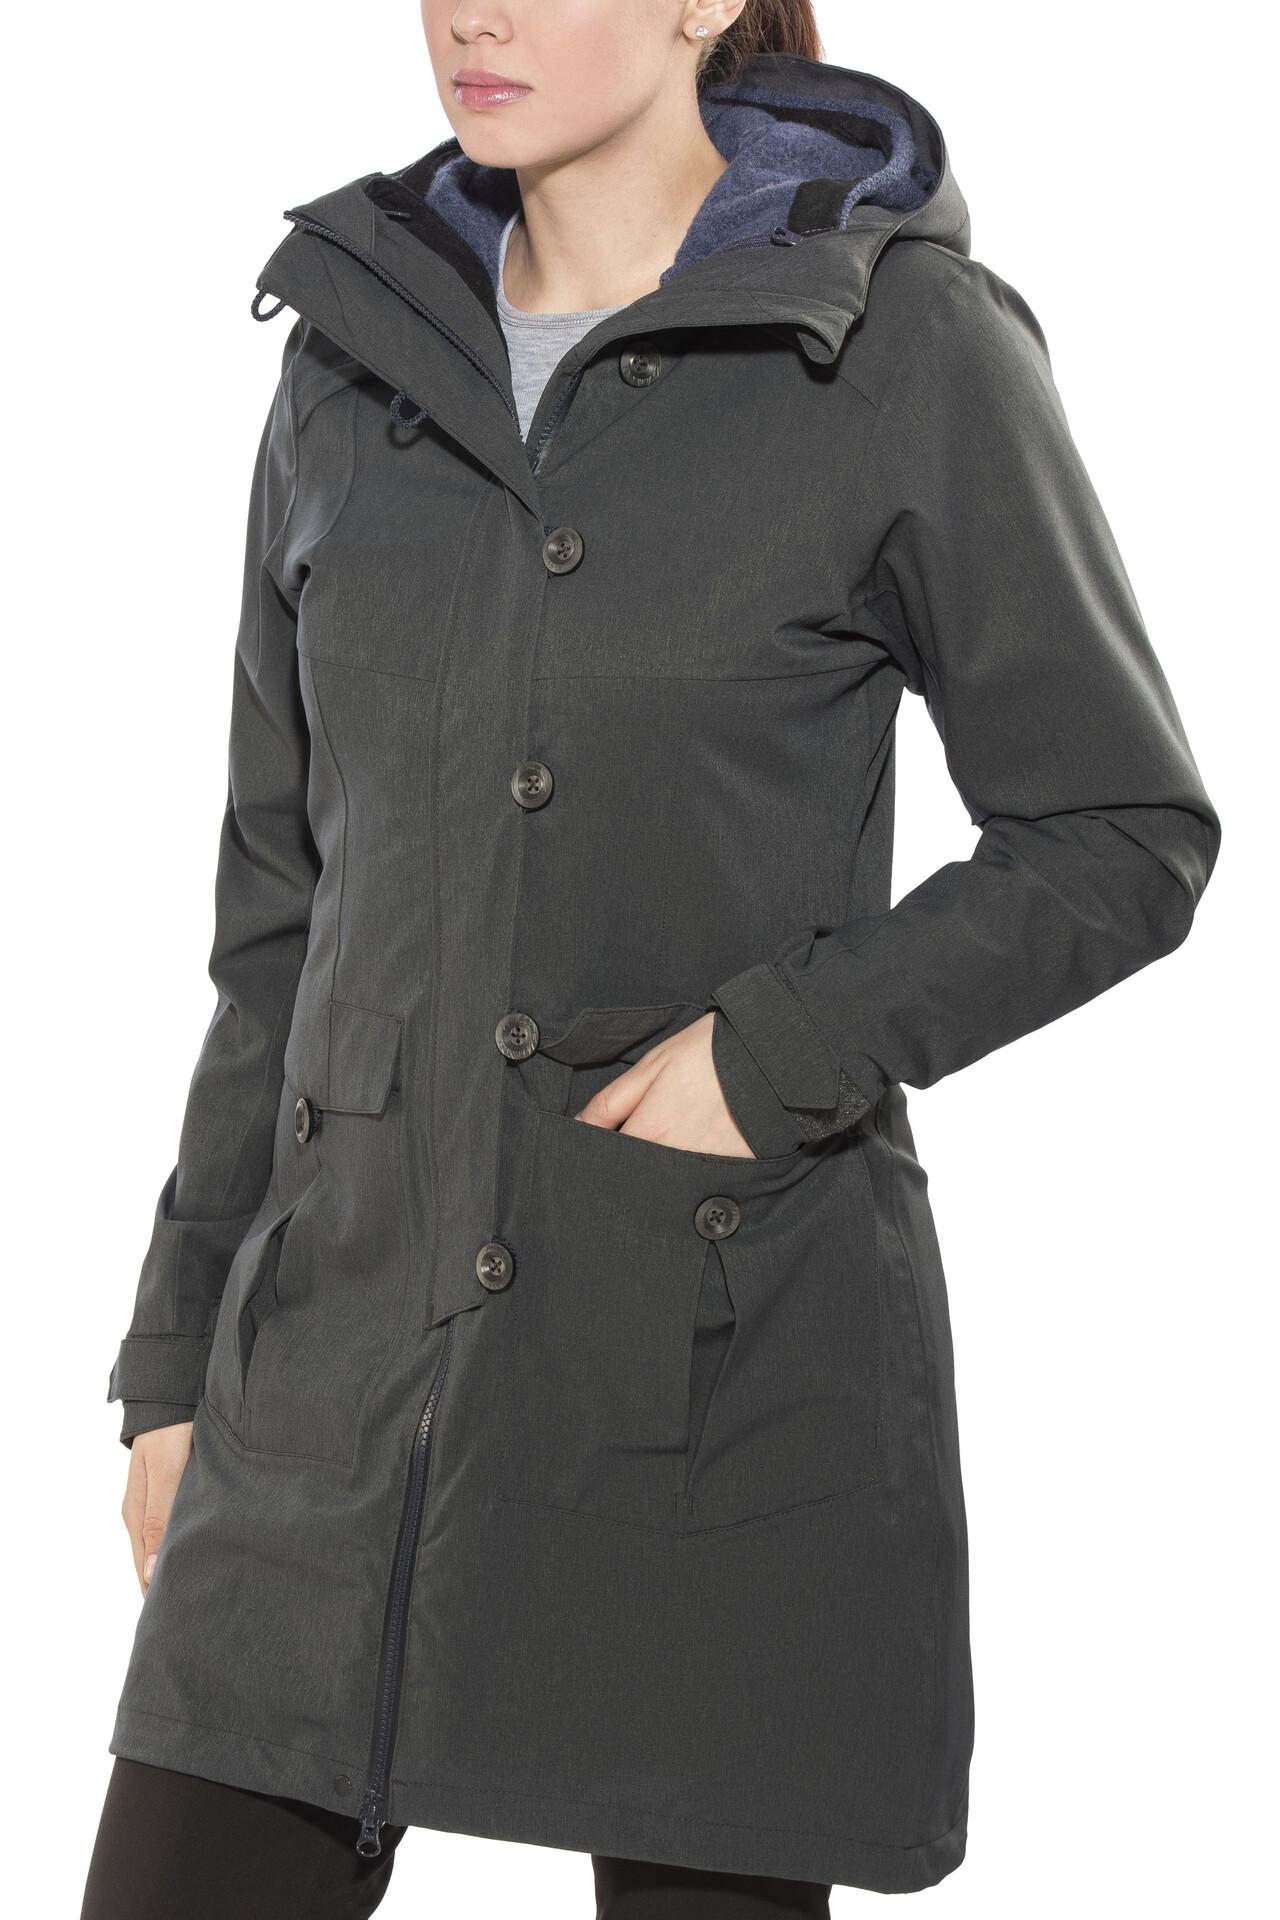 Bergans Bjerke 3in1 Coat Damen outer:solid charcoalinner:night blue